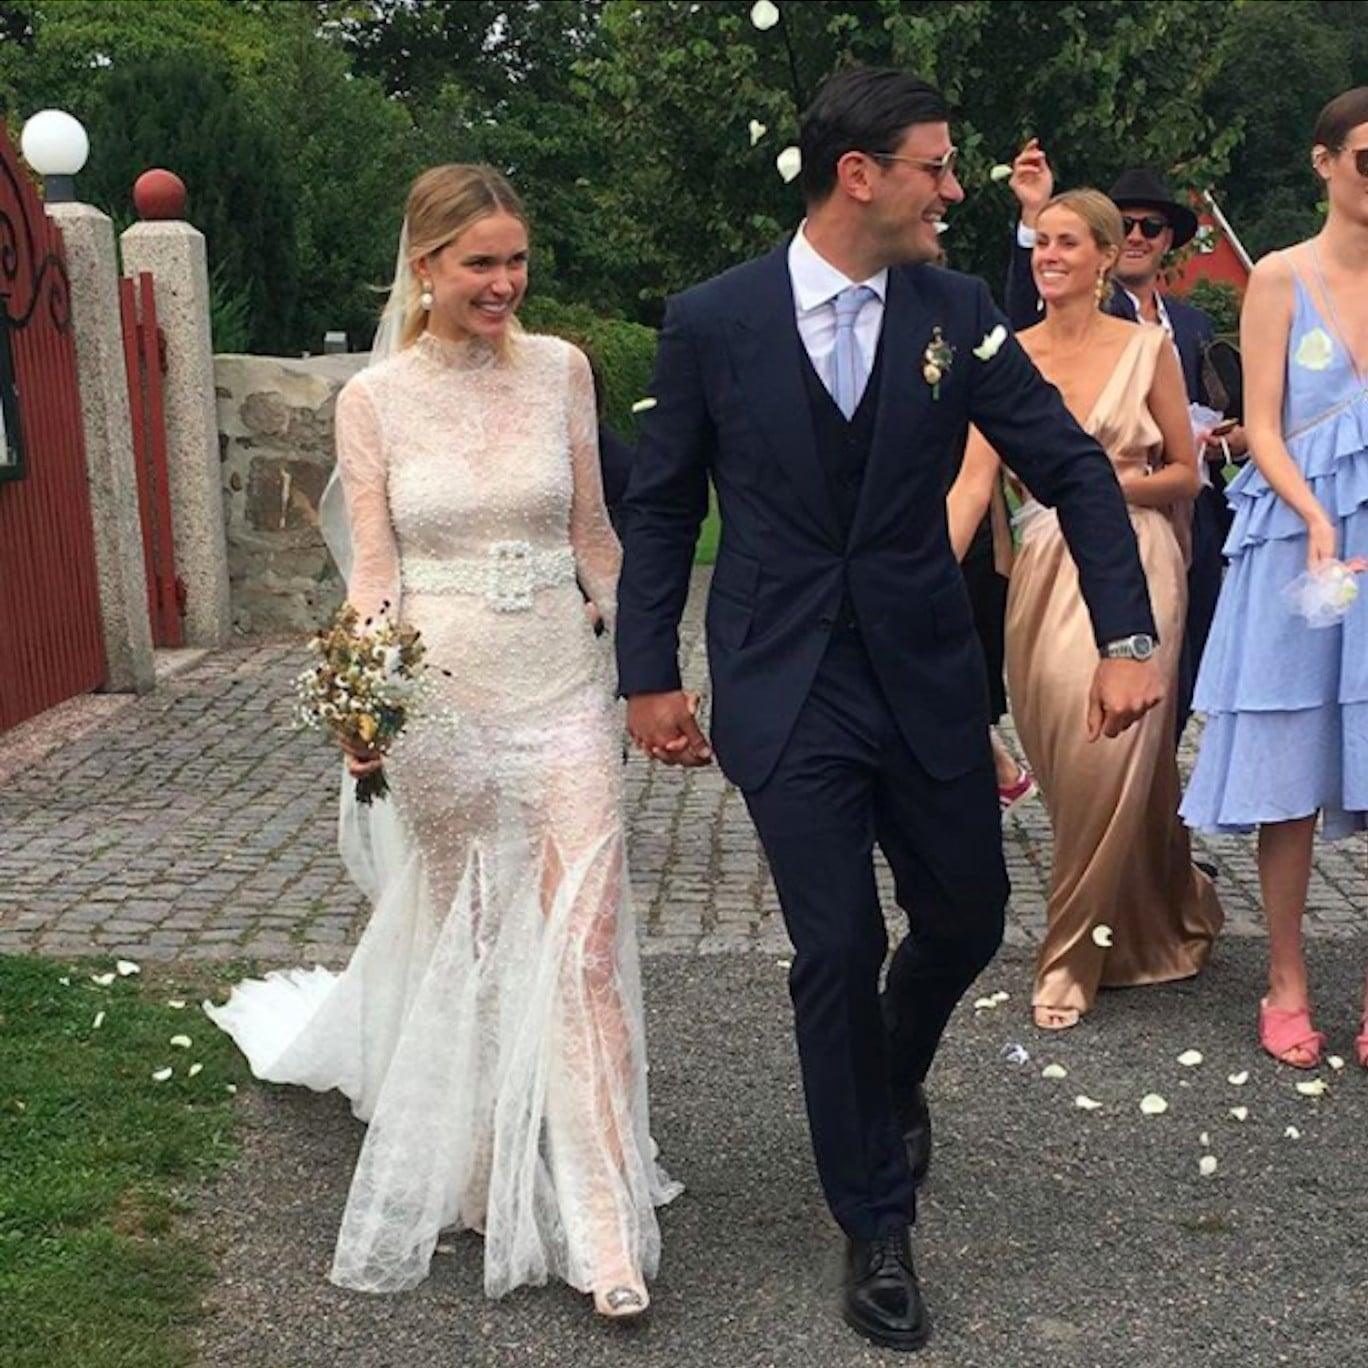 Pernille teisbaek vera wang wedding dress popsugar fashion junglespirit Choice Image